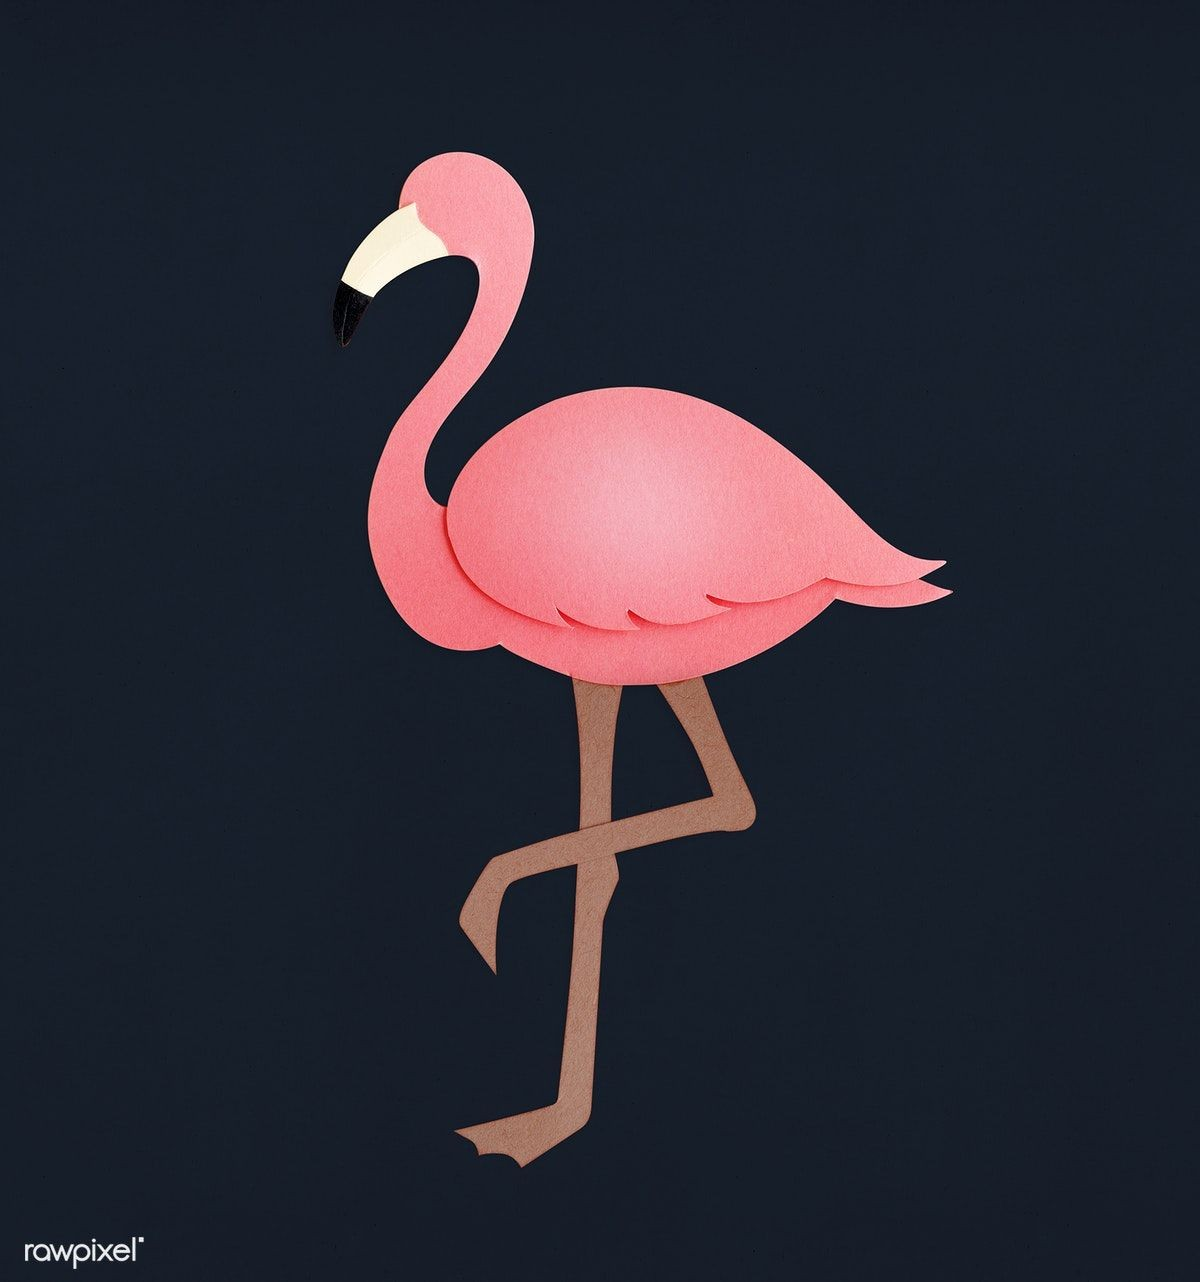 Avatar Papercraft Pink Flamingo Paper Craft Premium Image by Rawpixel